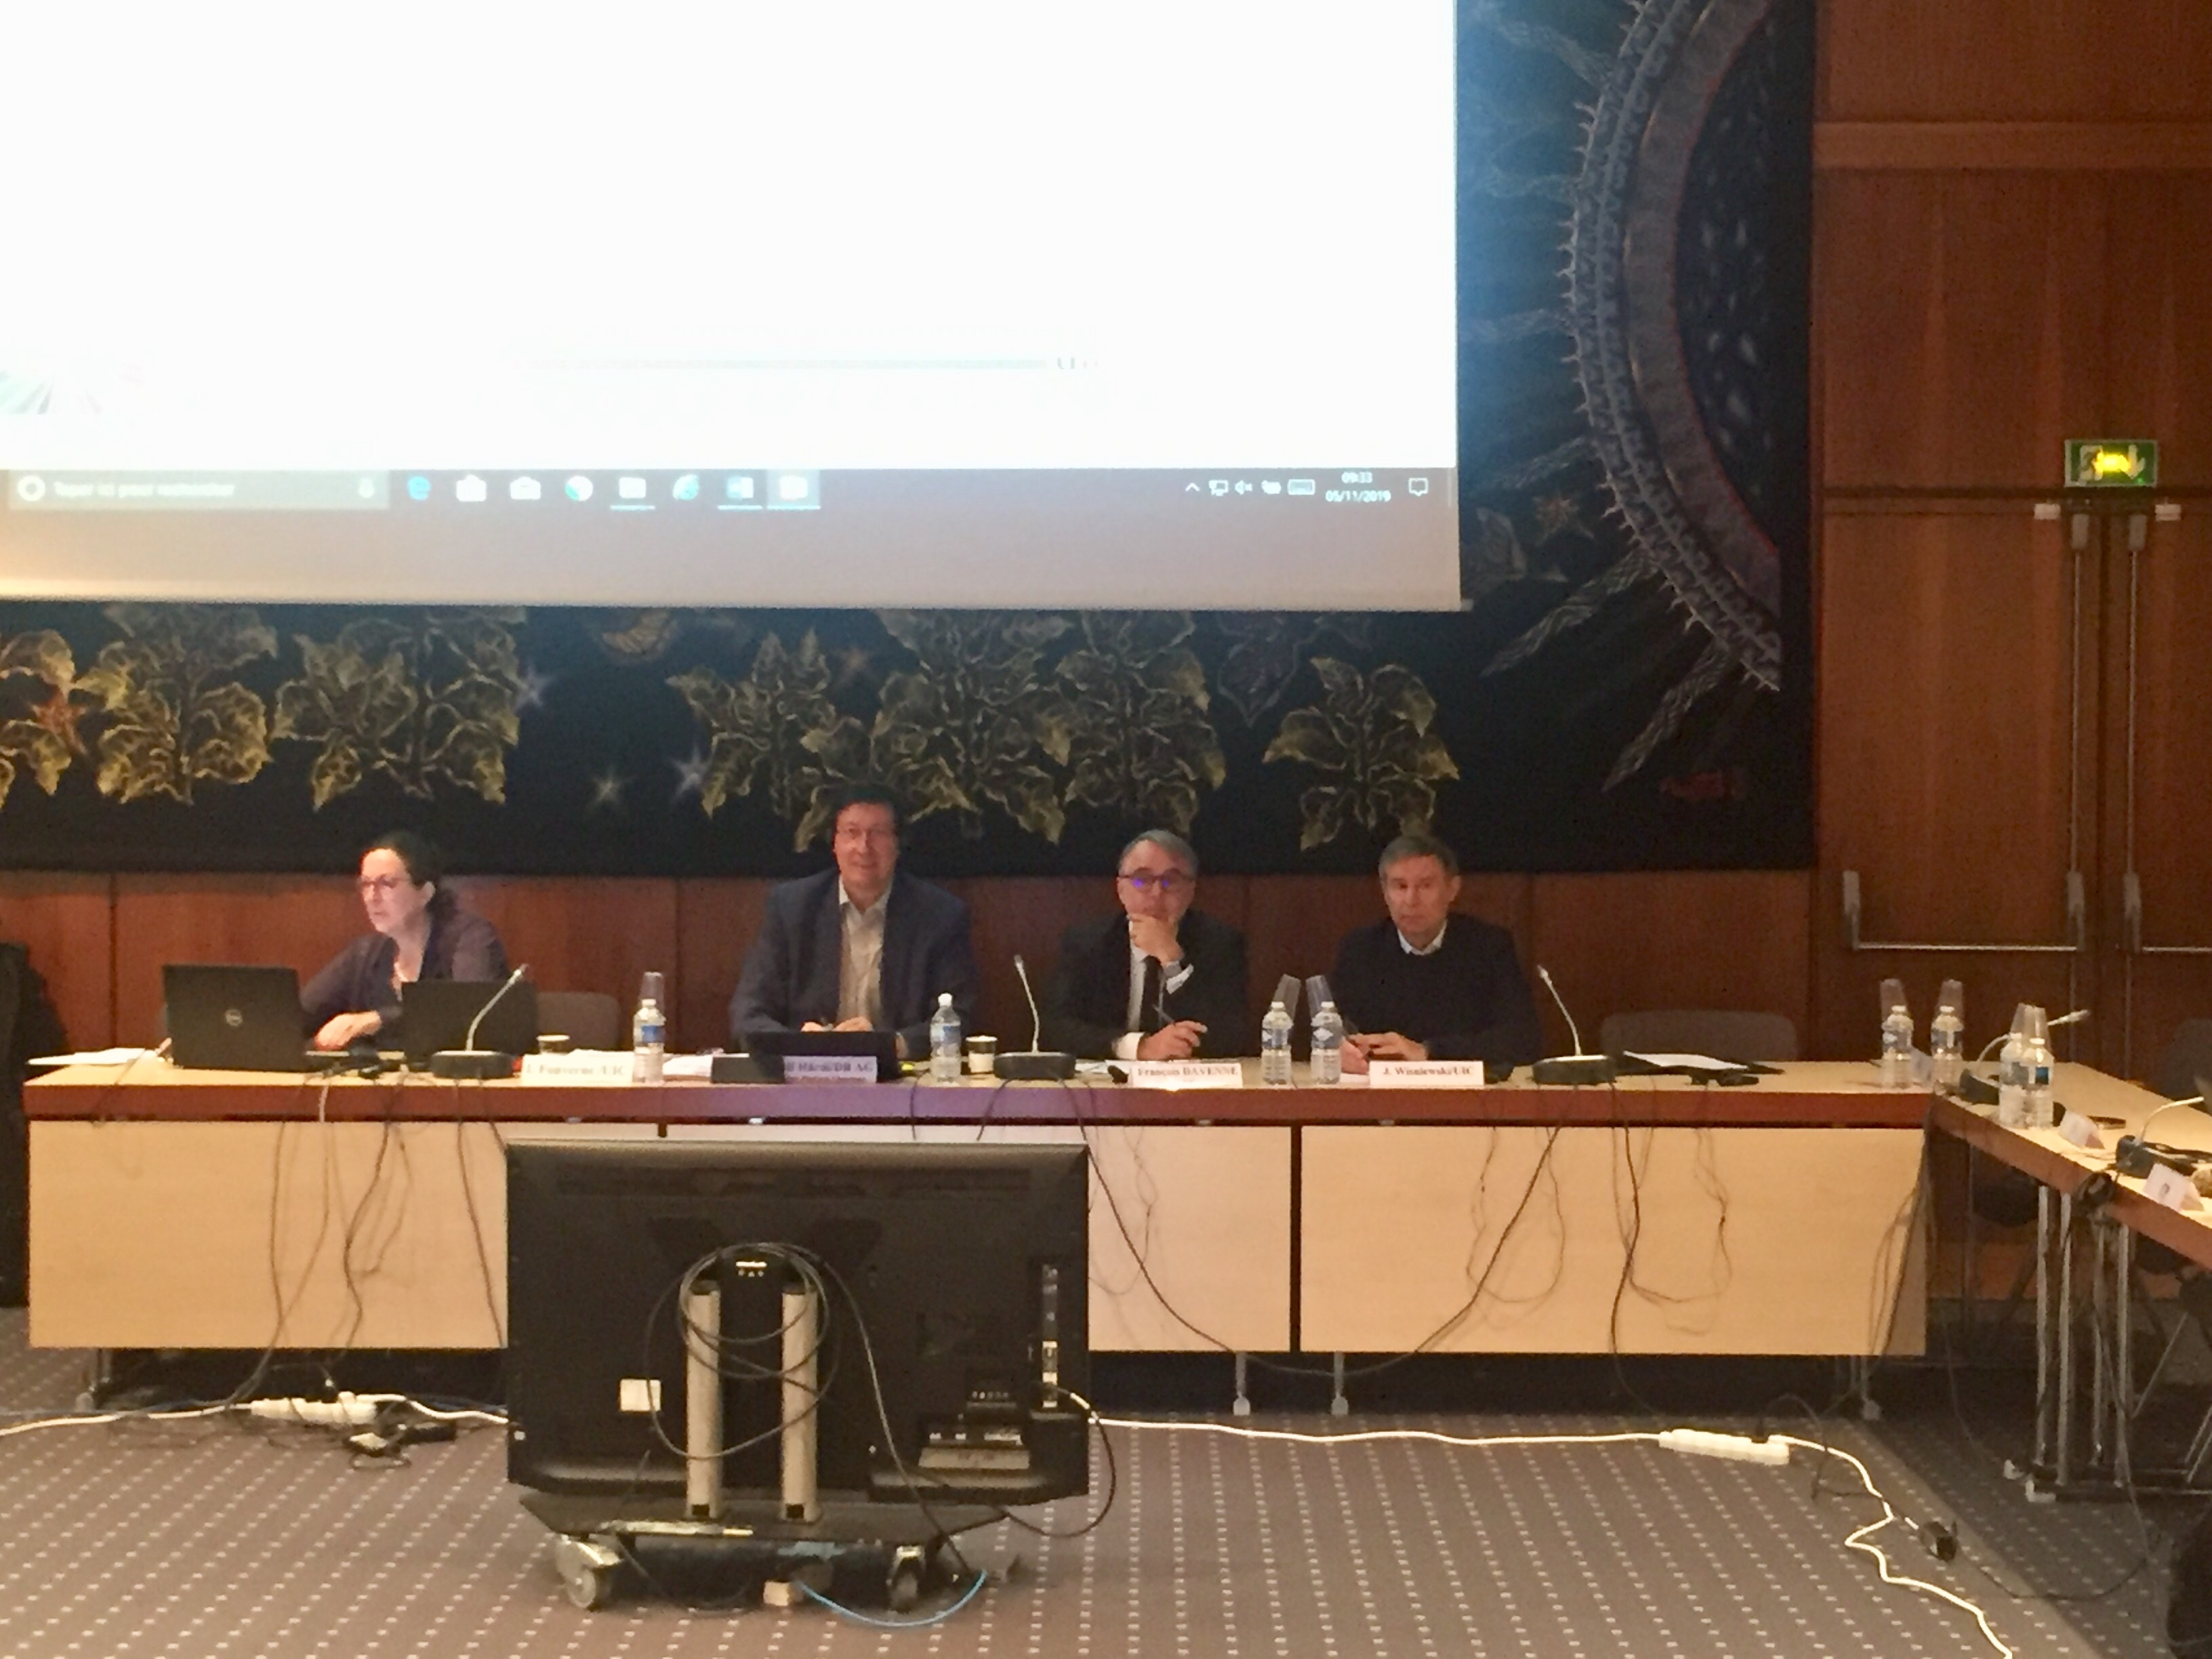 Uic Fall 2020 Calendar.Uic Safety Platform Plenary Meeting Held On 5 November 2019